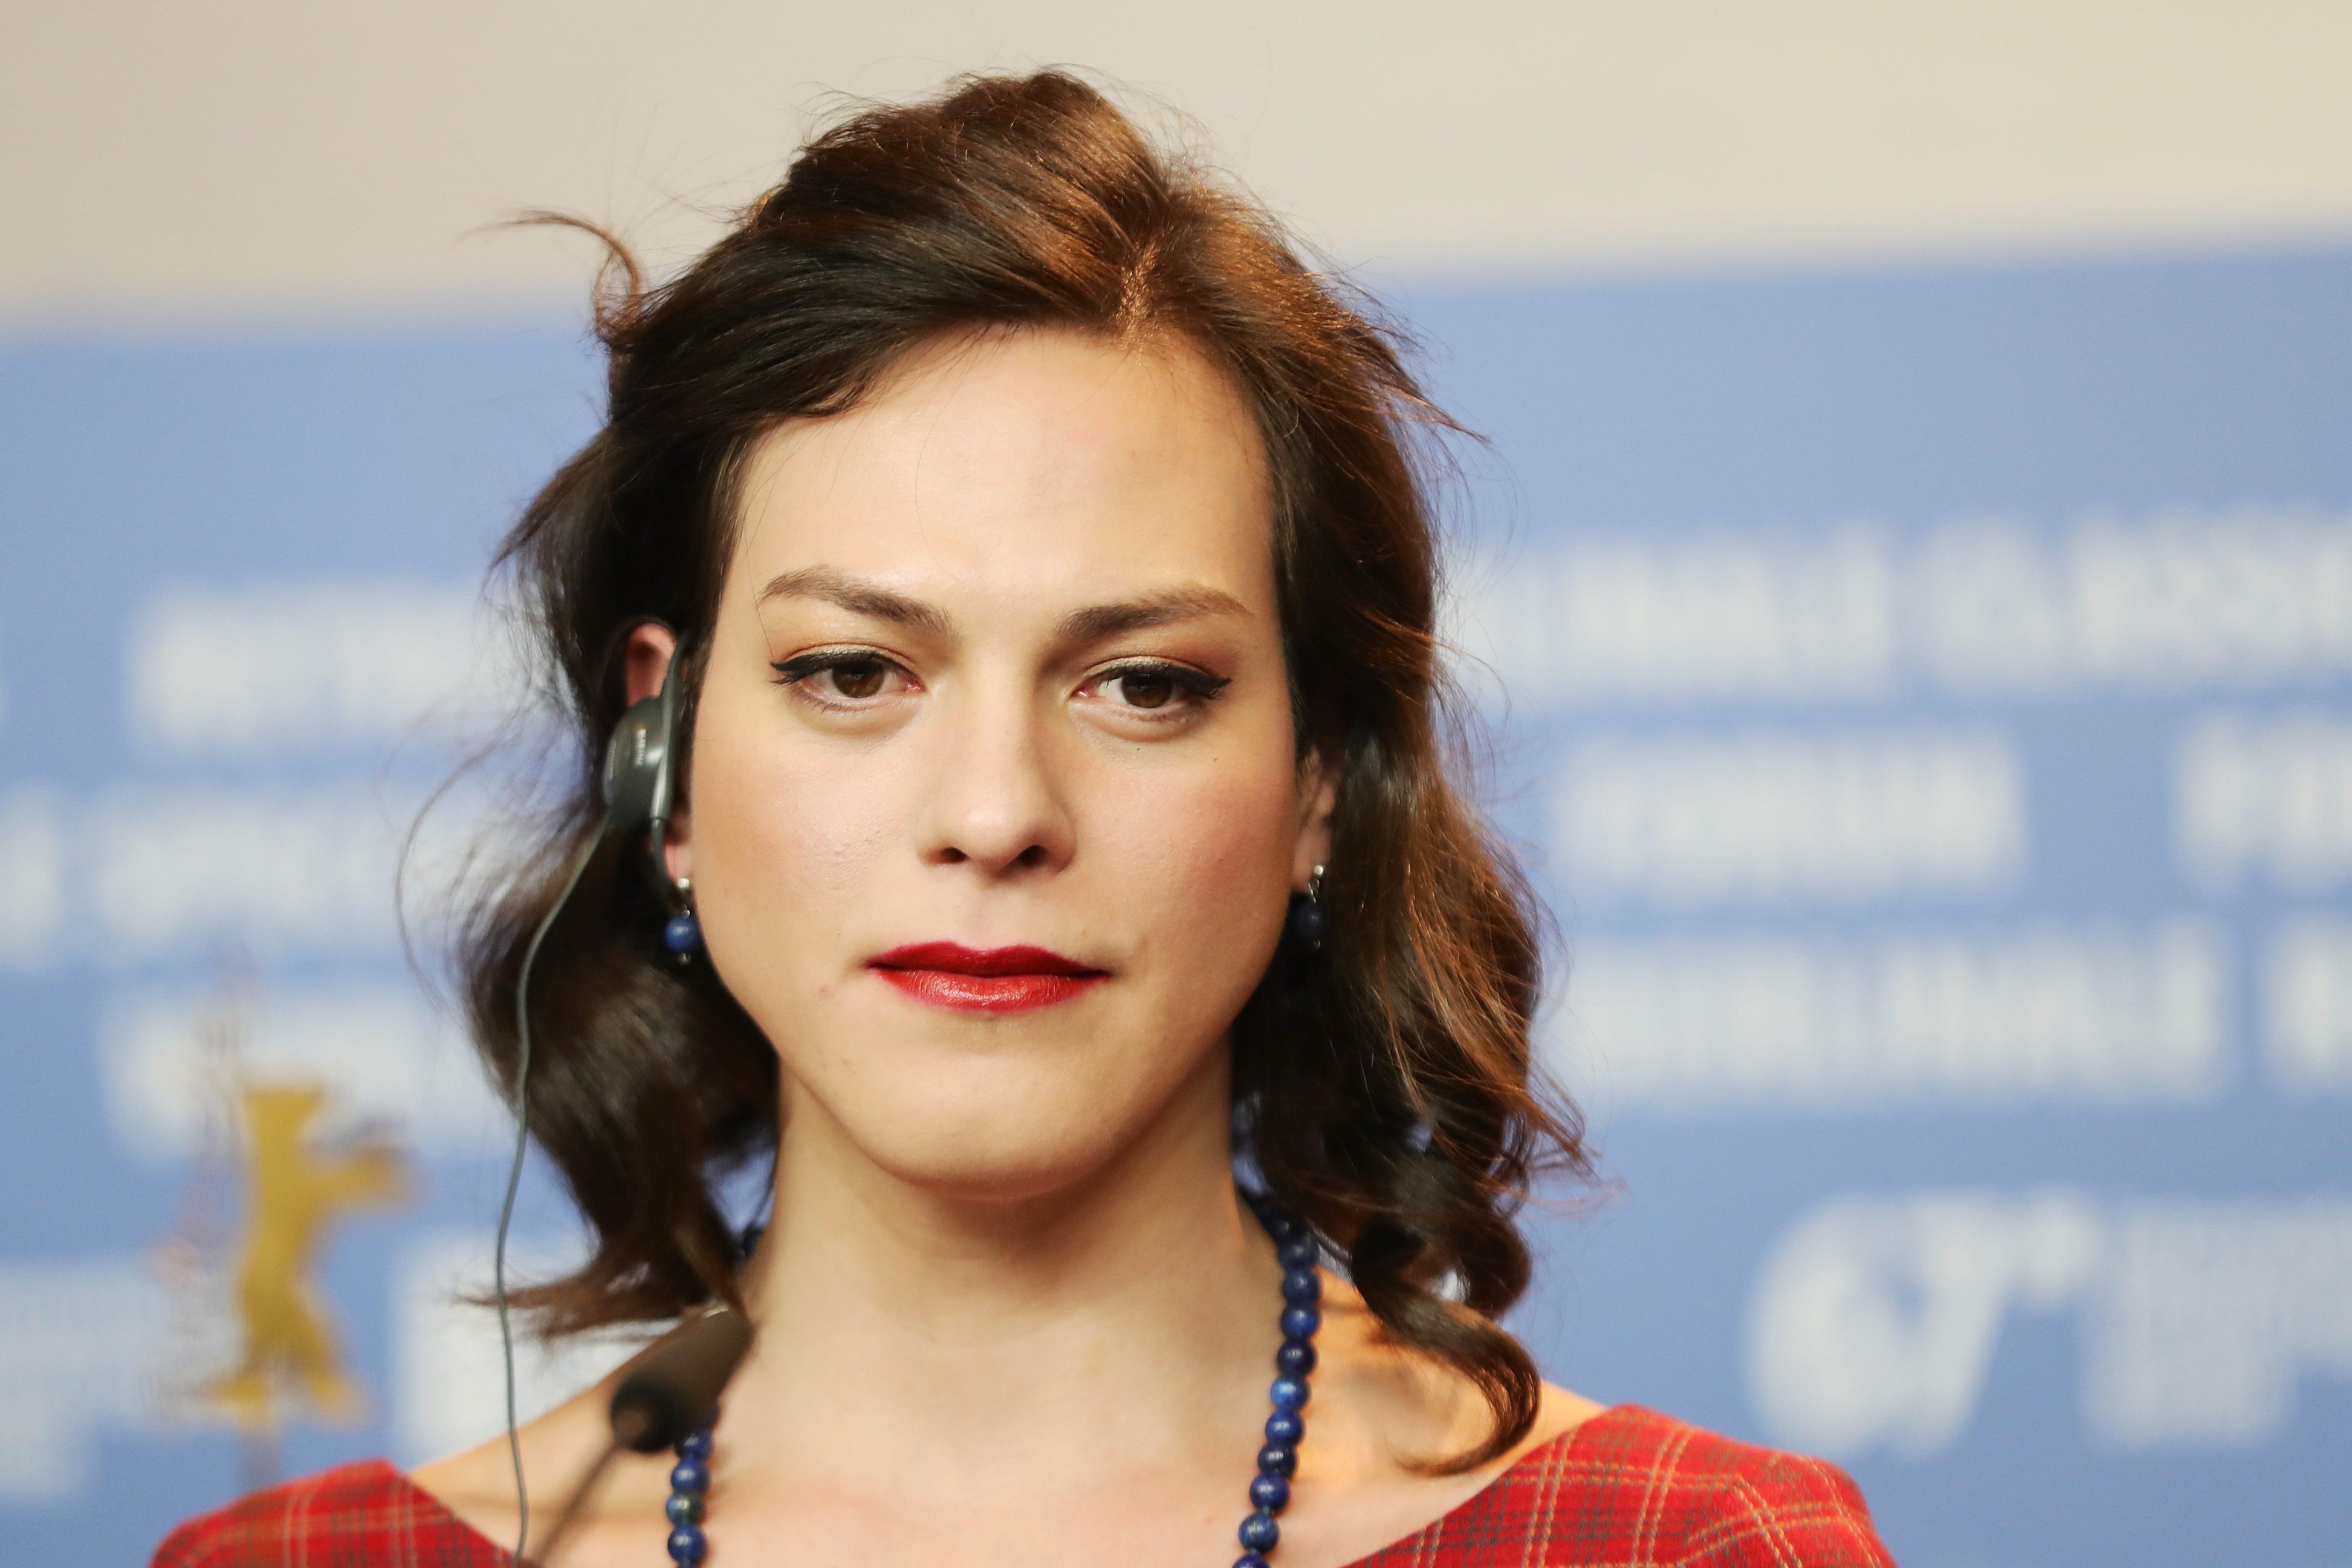 Trans Actress Daniela Vega Cast as Detective Solving Gender-Based Crimes in Chilean Series